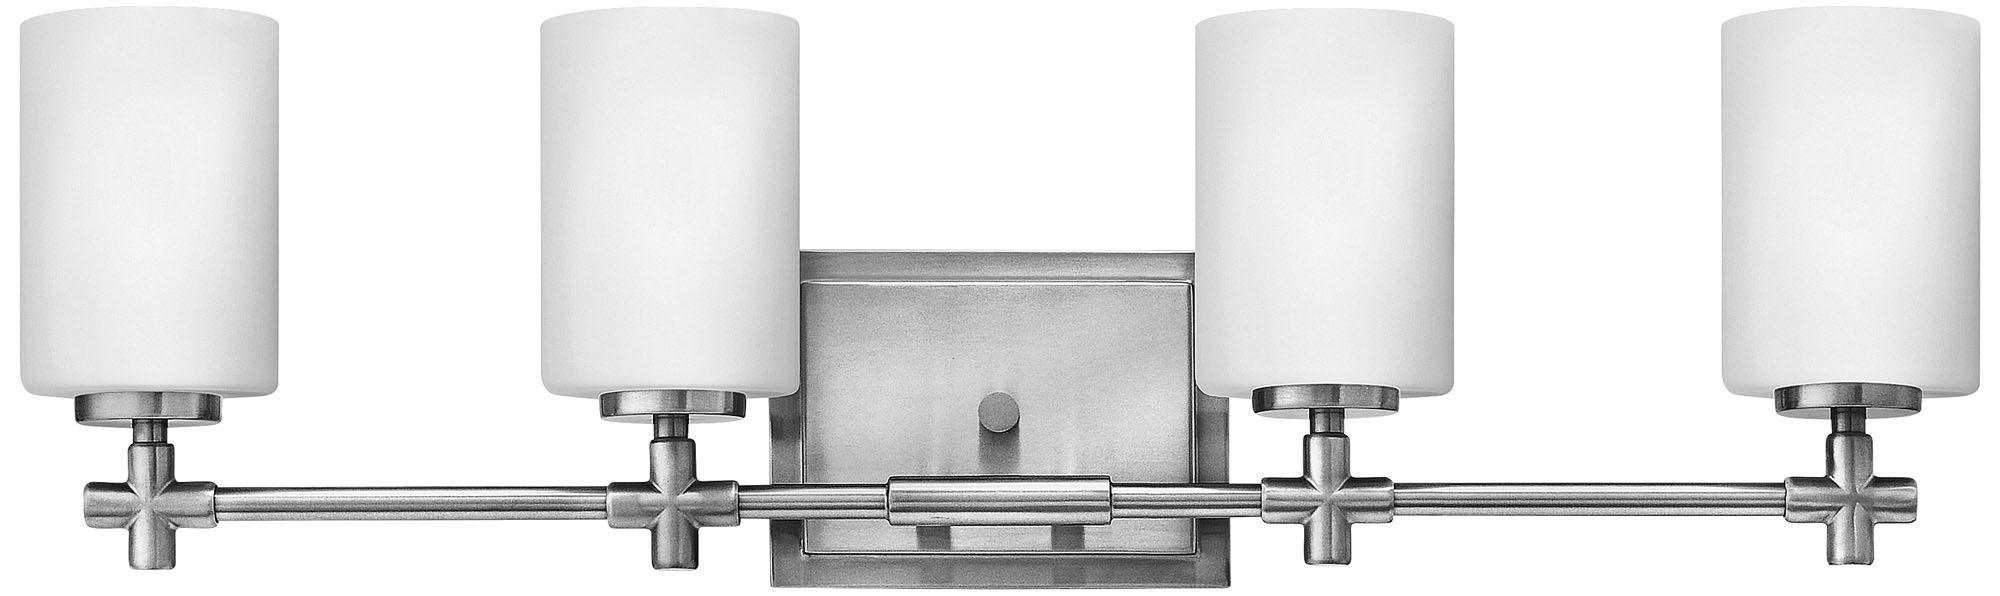 Hinkley Laurel 4-Light 27 3/4 W Brushed Nickel Bath Light  sc 1 st  L&s Plus & Hinkley Bathroom Lighting   Lamps Plus azcodes.com